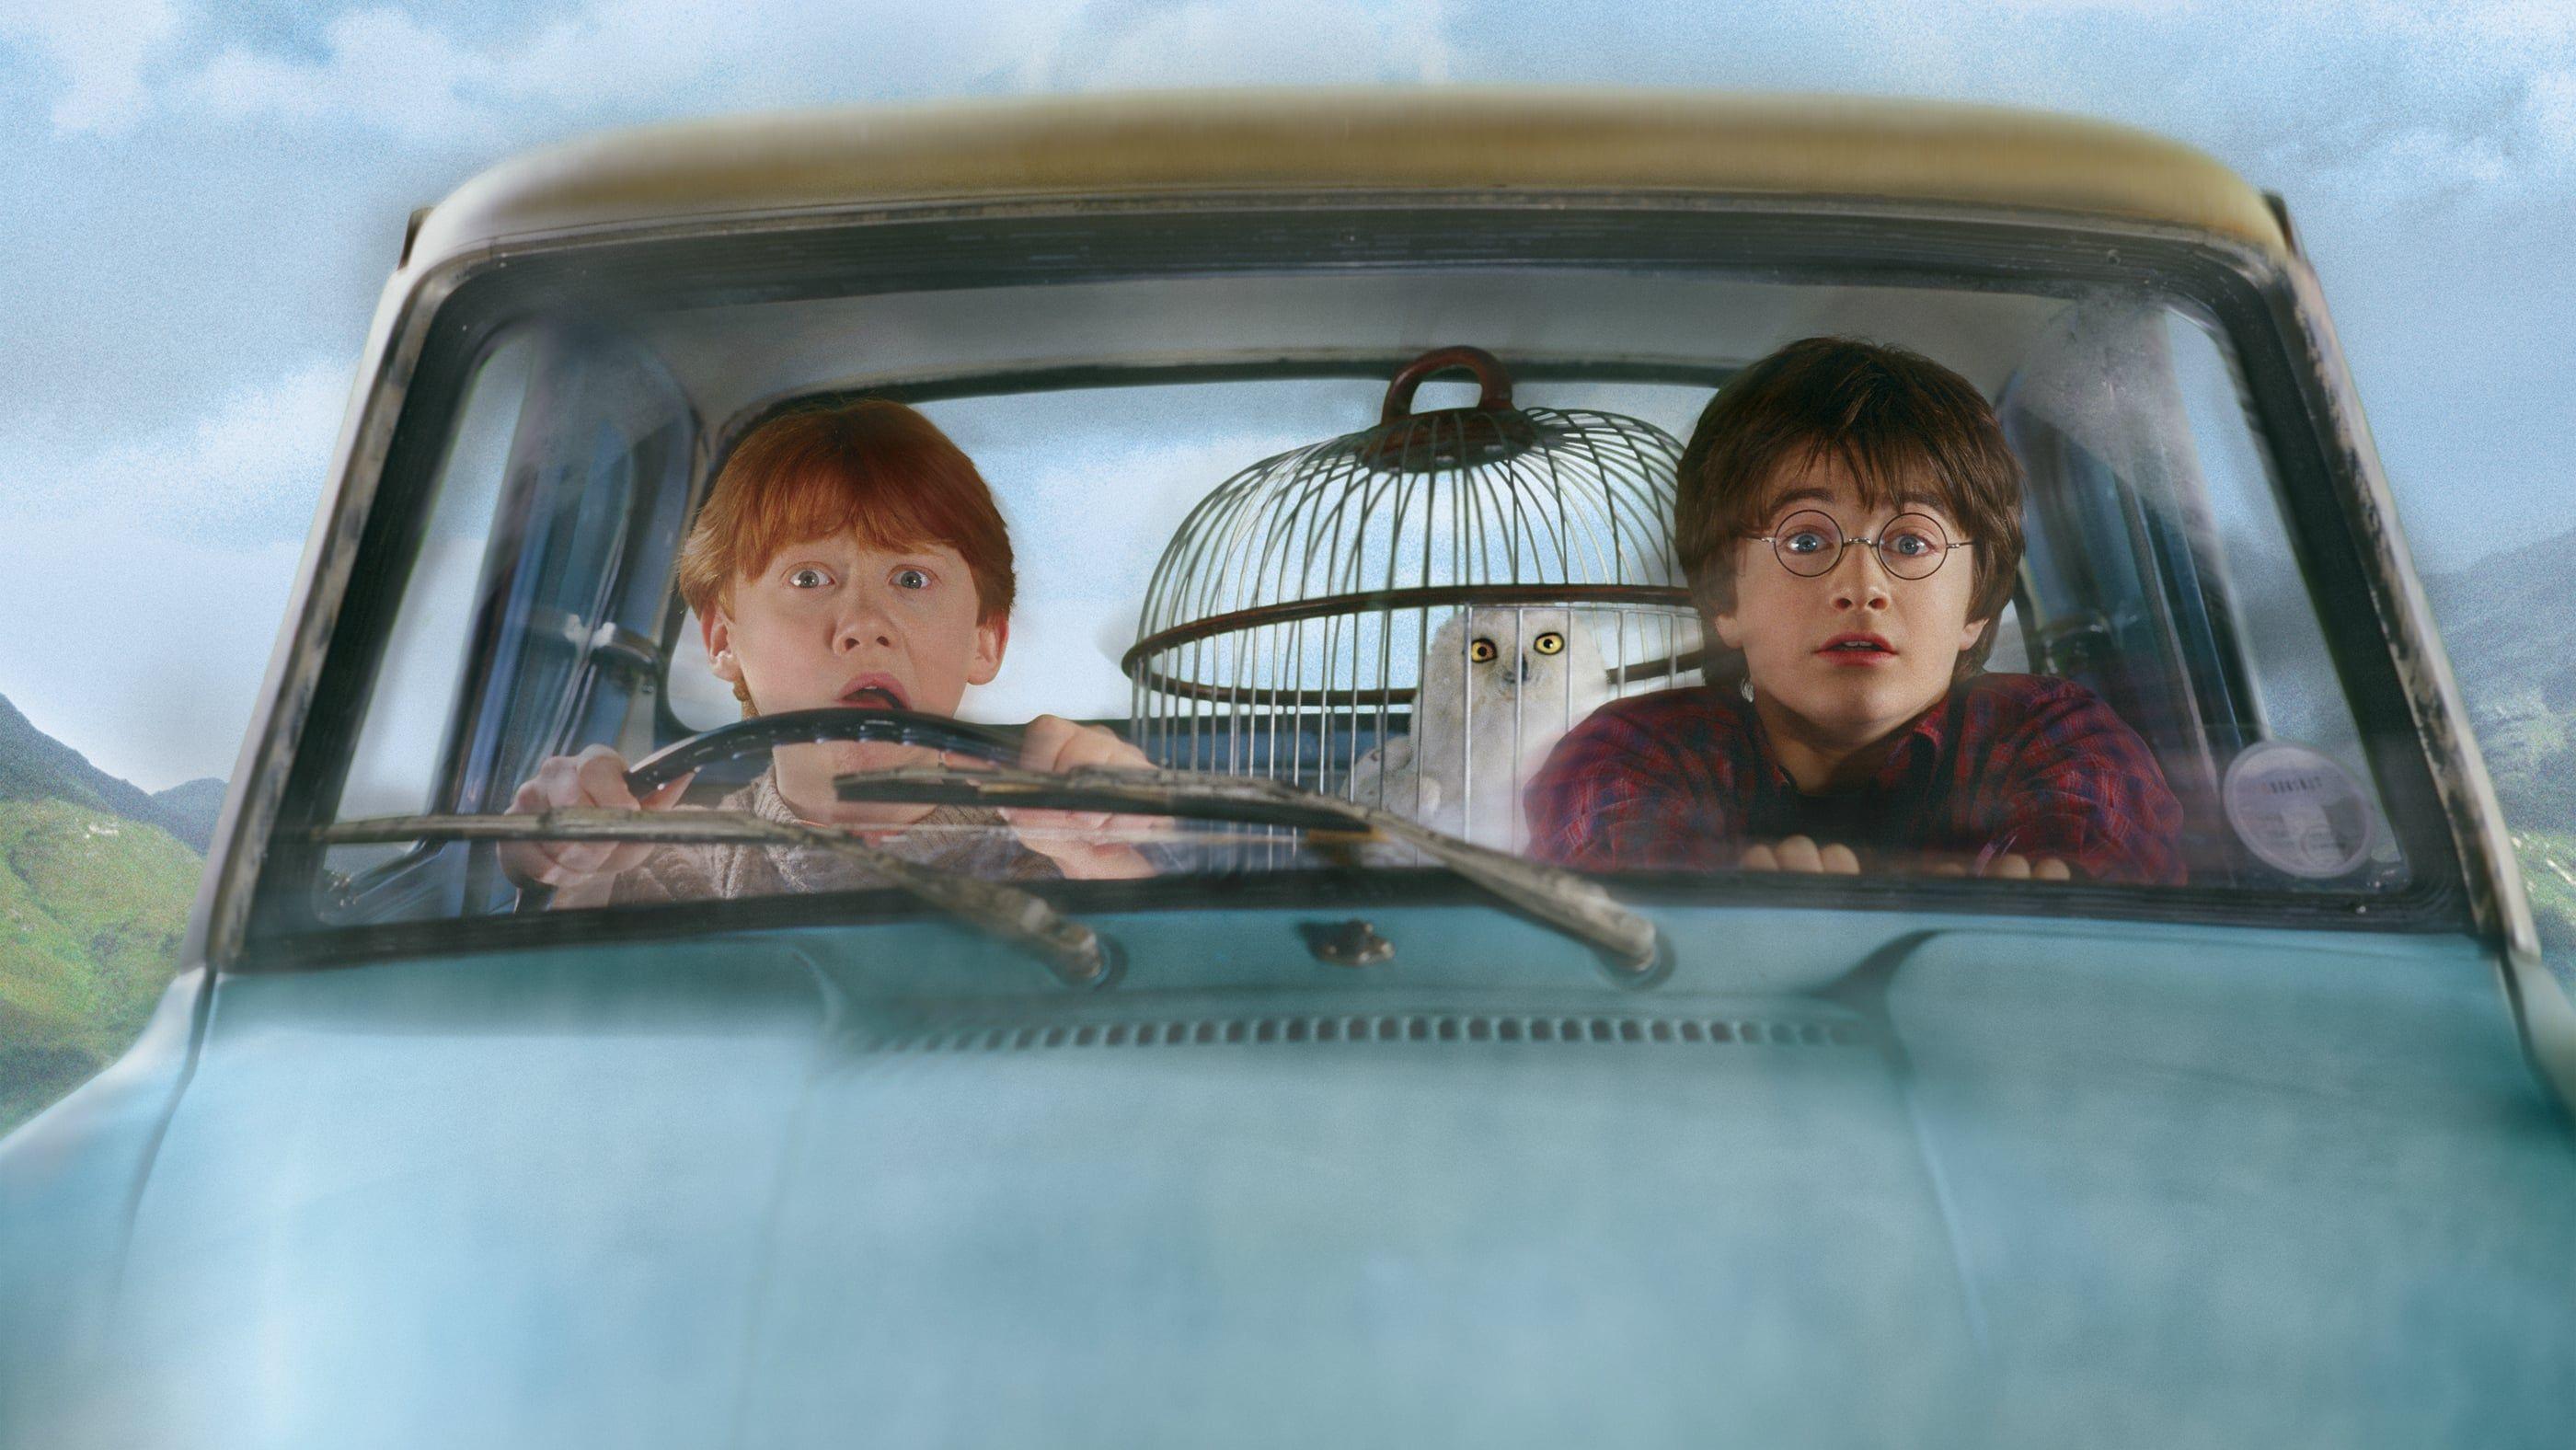 Harry Potter Es A Titkok Kamraja 2002 Putlocker Film Complet Streaming Harry Potter Nyari Vakacioja Harry Potter Car Harry Potter Movies Harry Potter Wallpaper